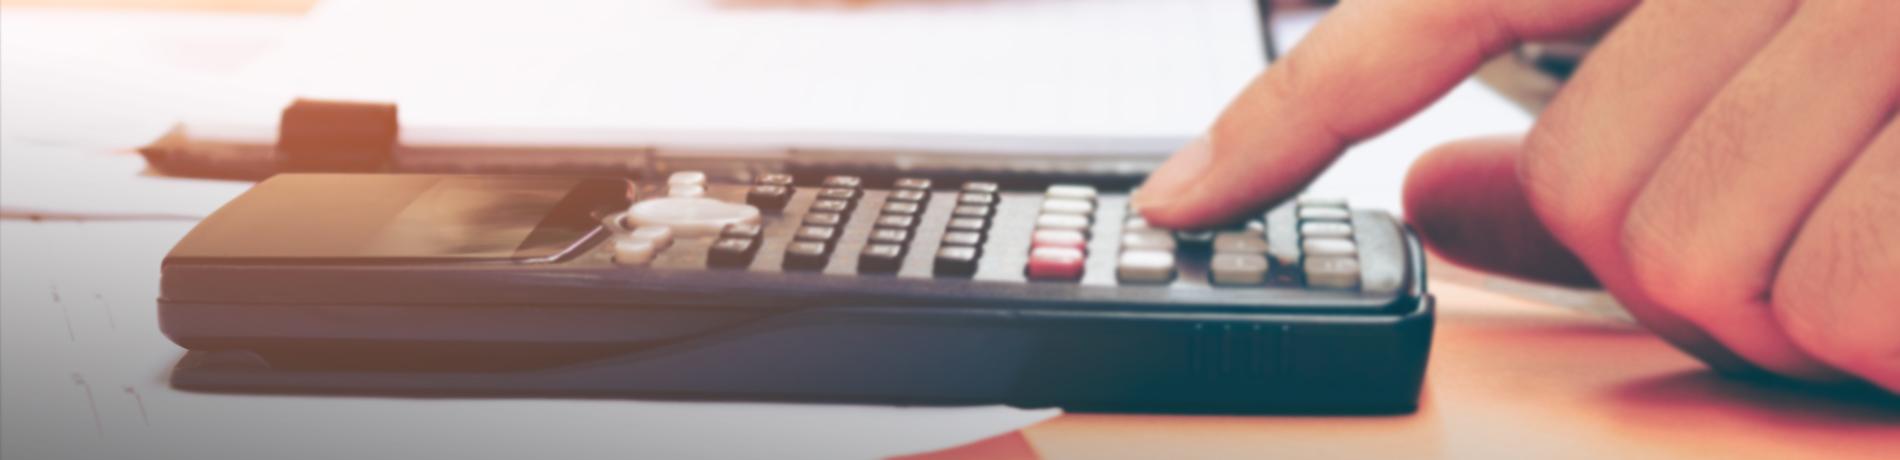 women-using-calculator